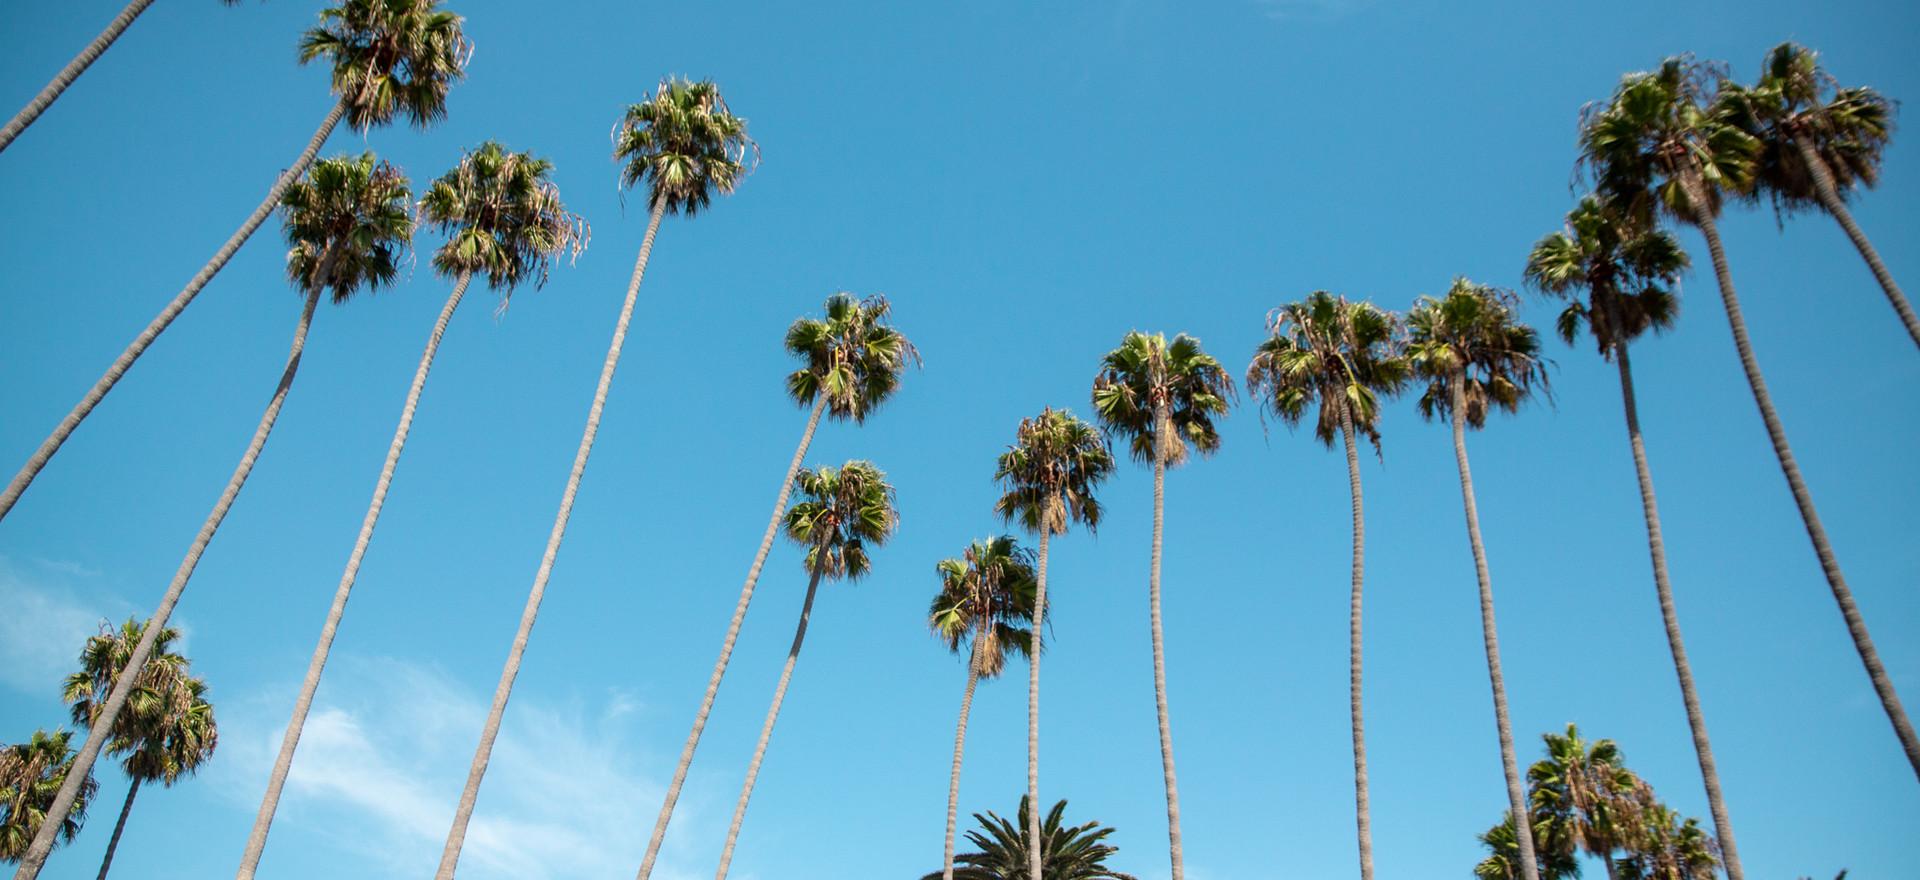 Califfornia, Santa Monica